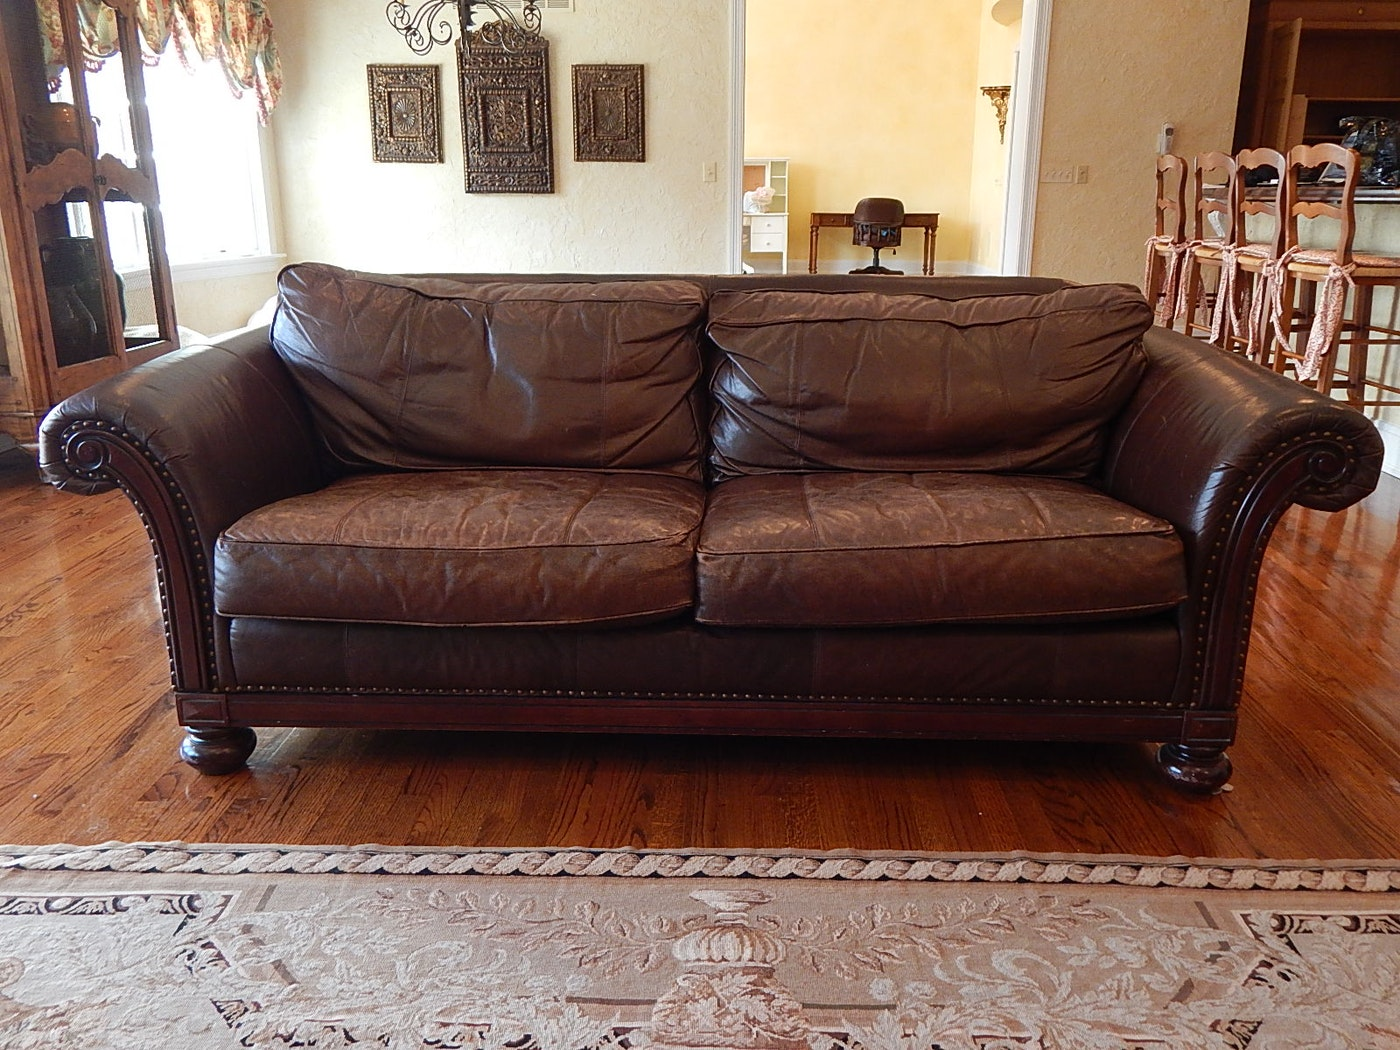 Bernhardt Brown Leather Sofa | EBTH